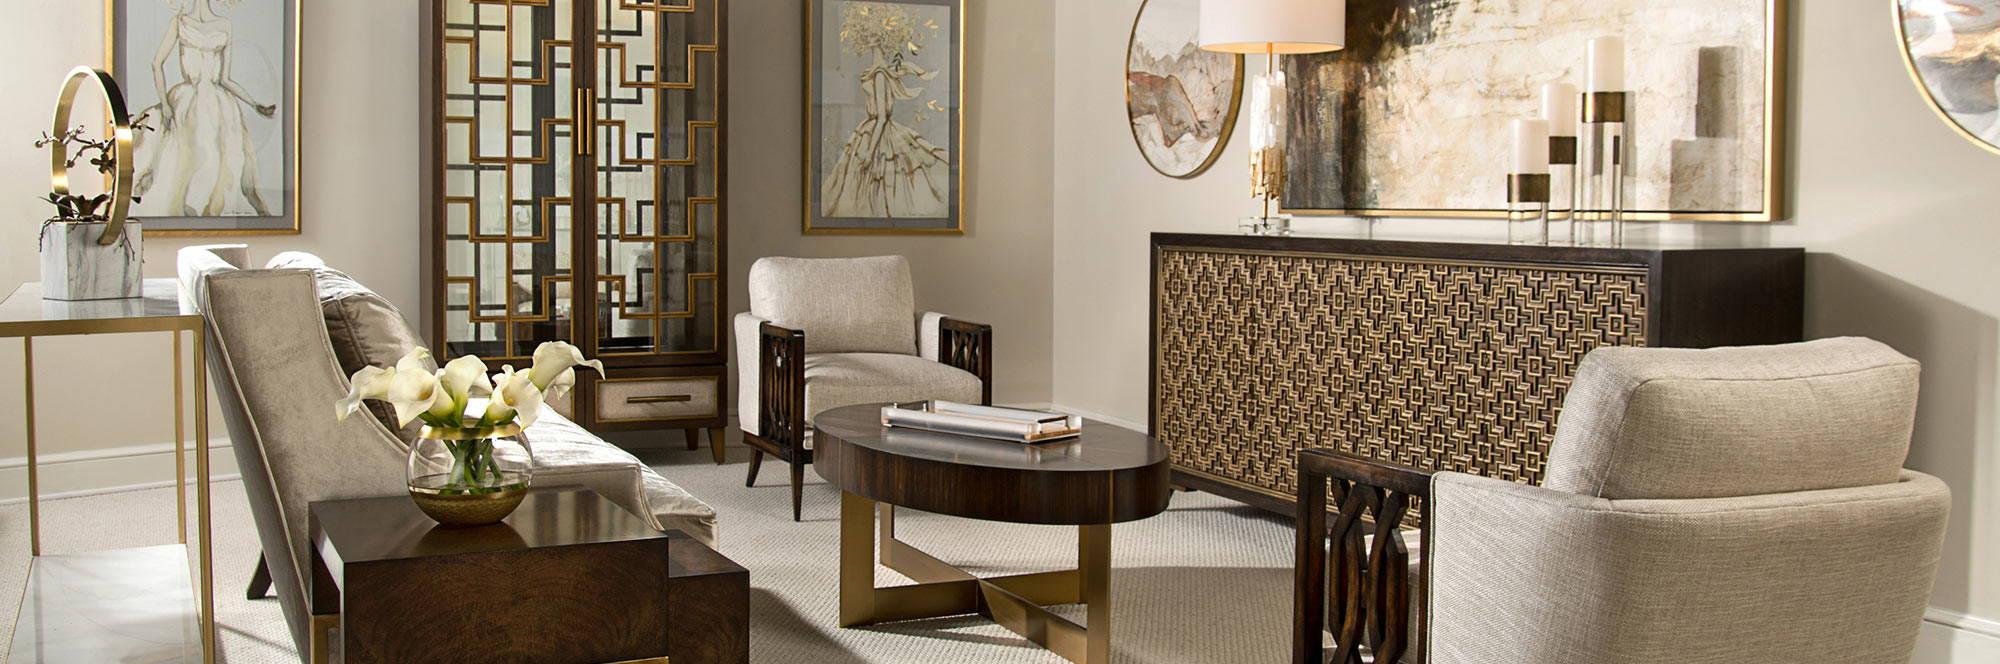 John-Richard Furniture & Home Accessories - Lounge Scheme - LuxDeco.com